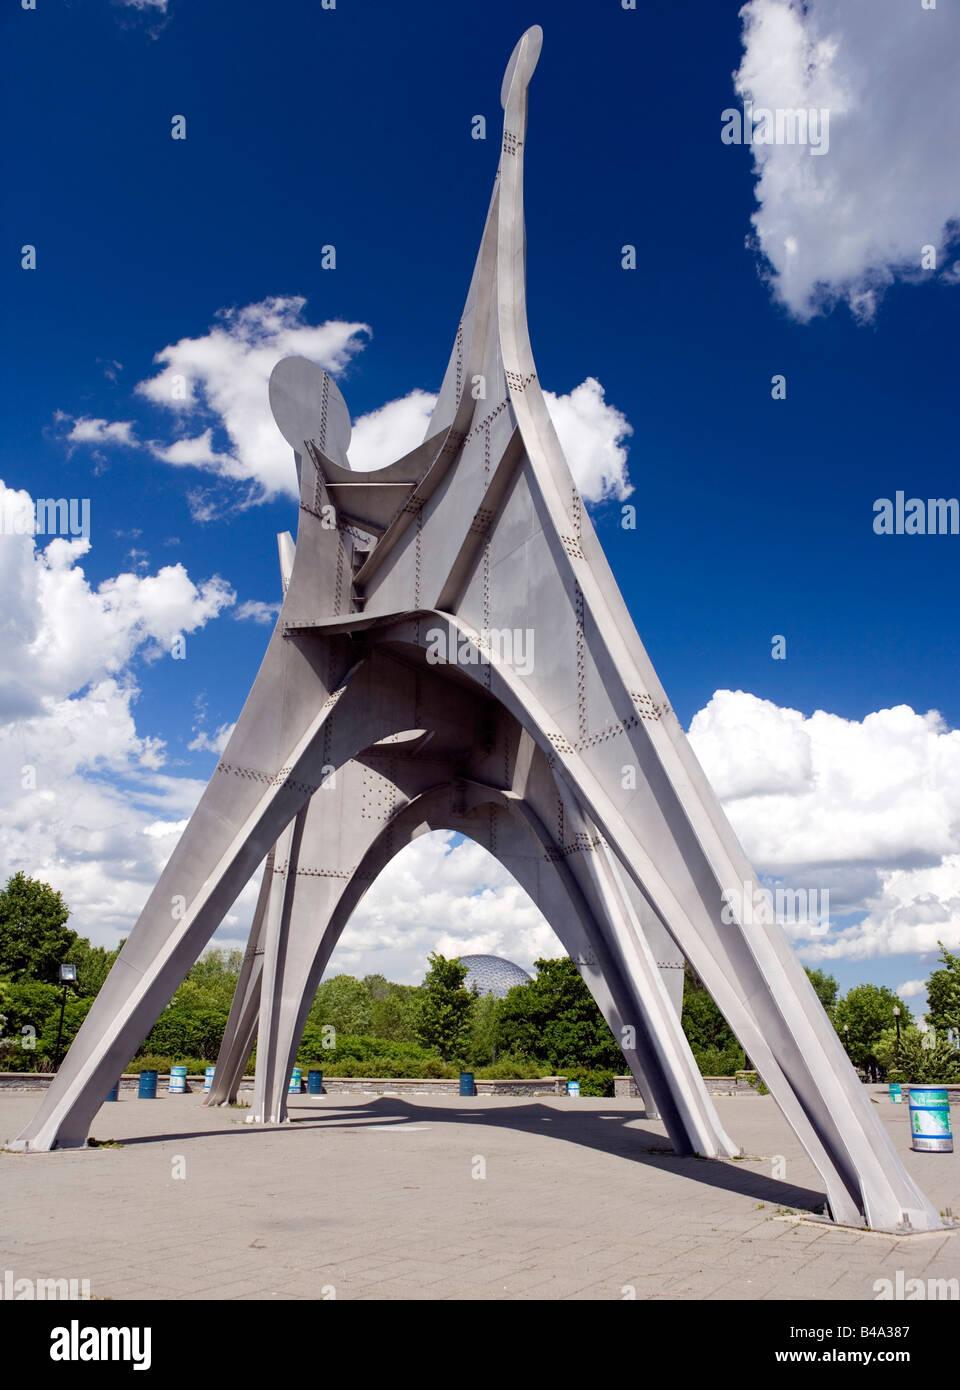 Calders Stabile berechtigt Mann in Montreal, Kanada. Stockbild